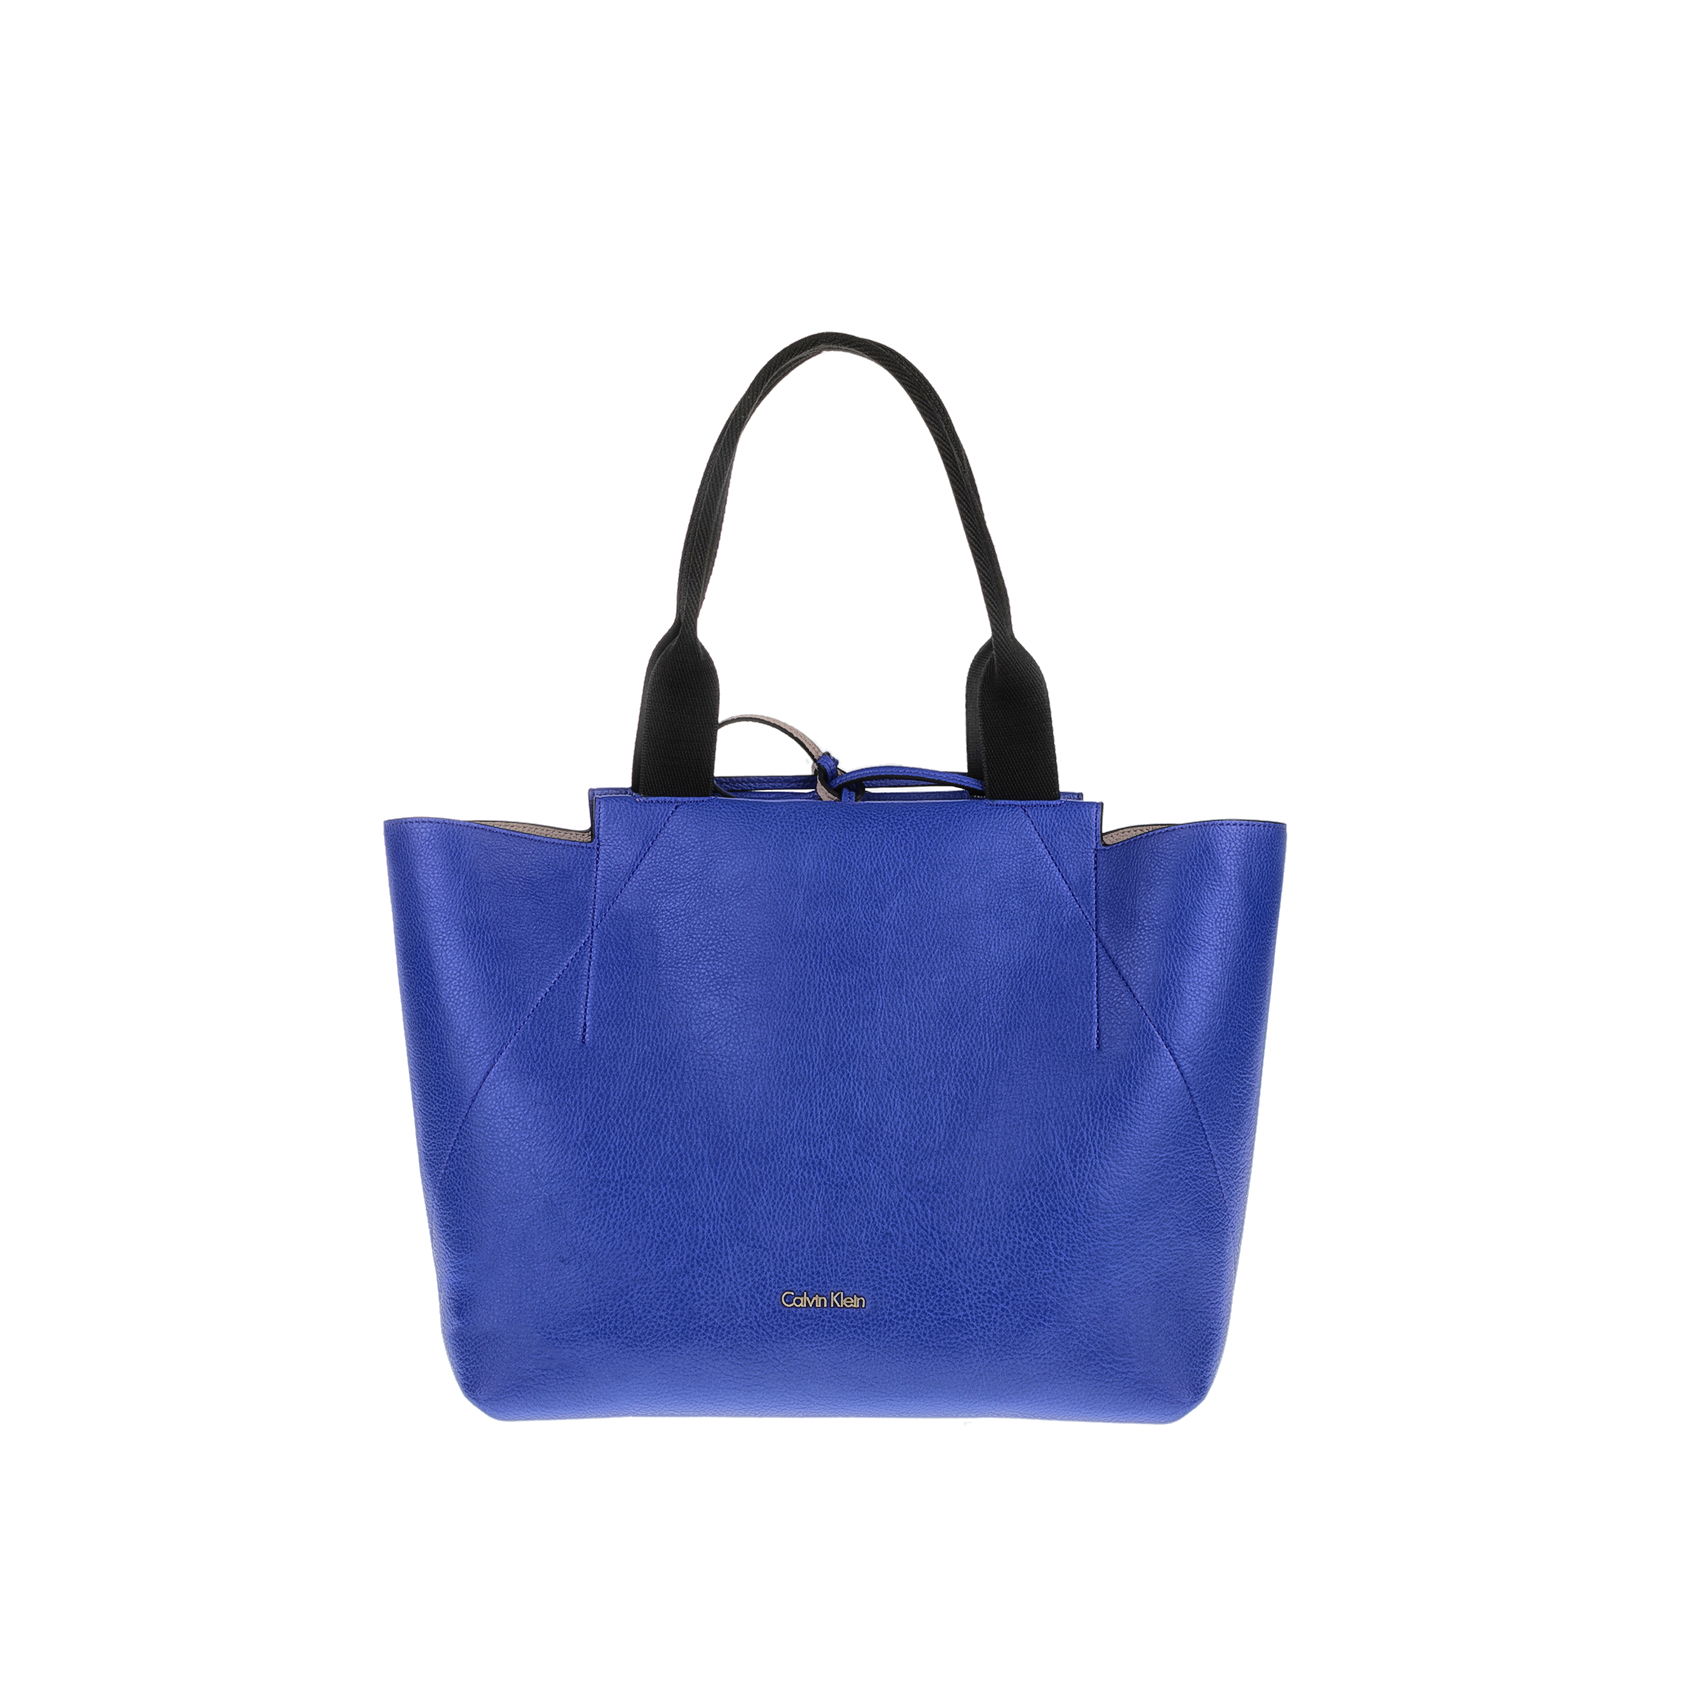 CALVIN KLEIN JEANS - Γυναικέια τσάντα CALVIN KLEIN JEANS IS4 LARGE μπεζ-μπλε γυναικεία αξεσουάρ τσάντες σακίδια χειρός